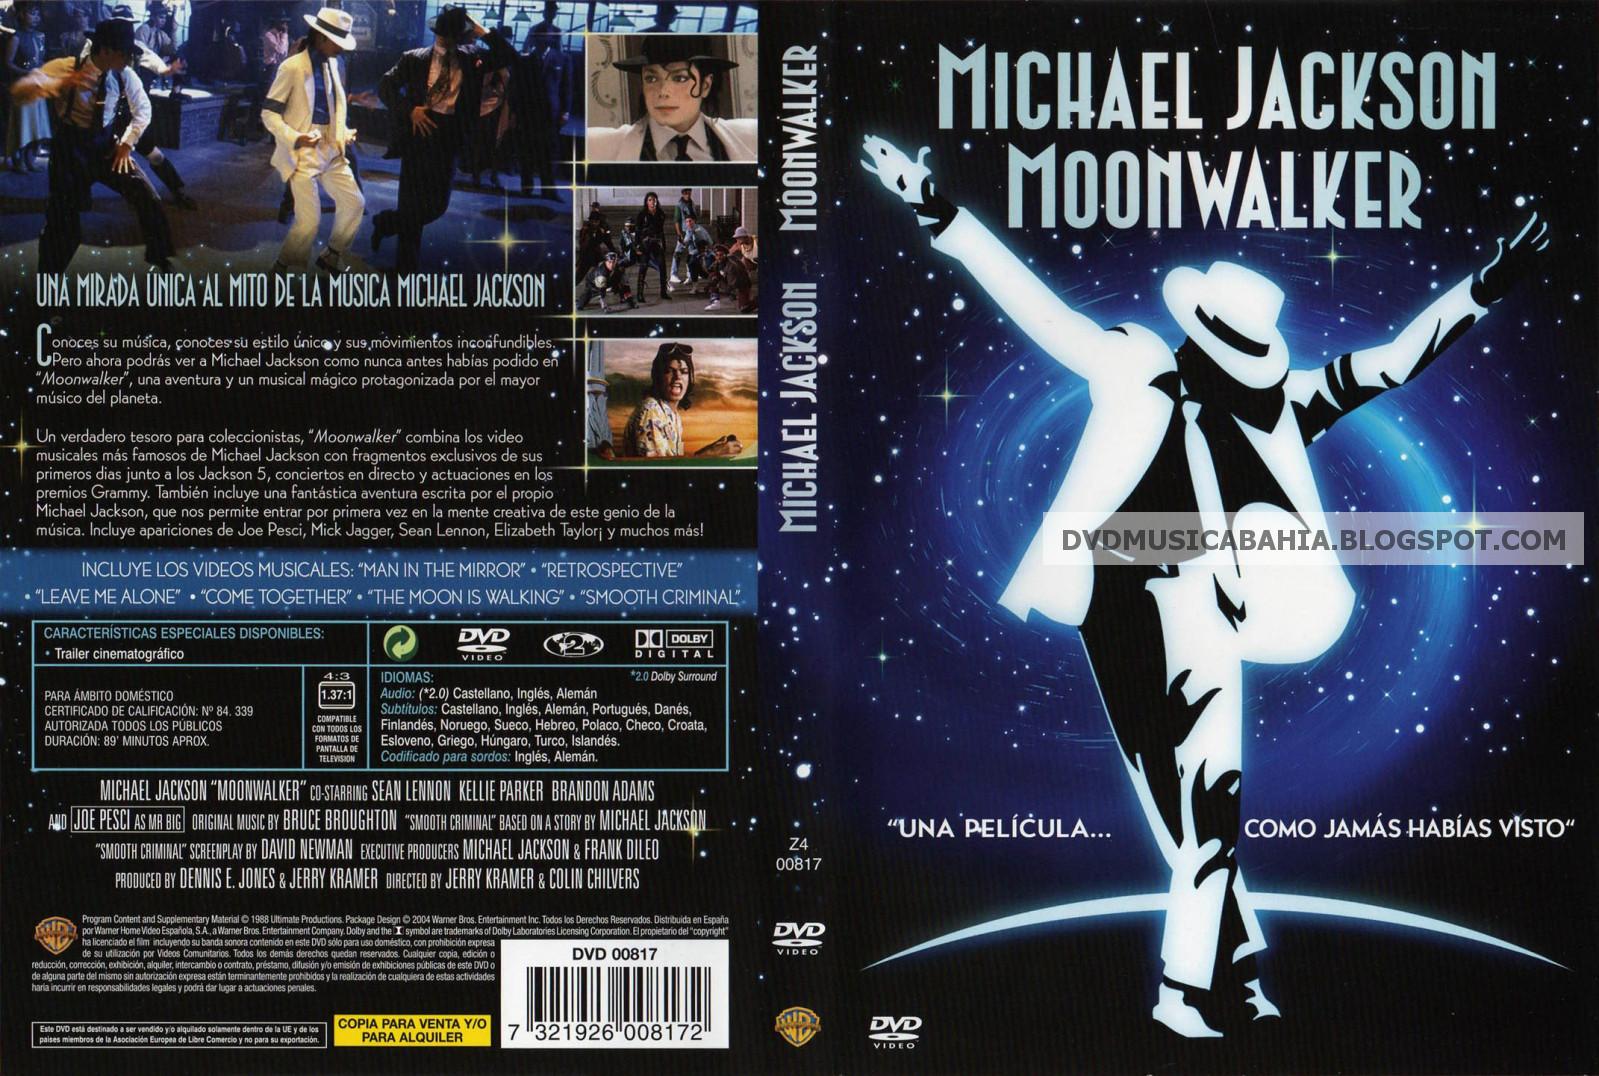 http://1.bp.blogspot.com/_PiUVny6RPwY/THwJZ-t7u5I/AAAAAAAABEg/8BX2teIqS2Q/s1600/Michael+Jackson+-+Moonwalker.jpg